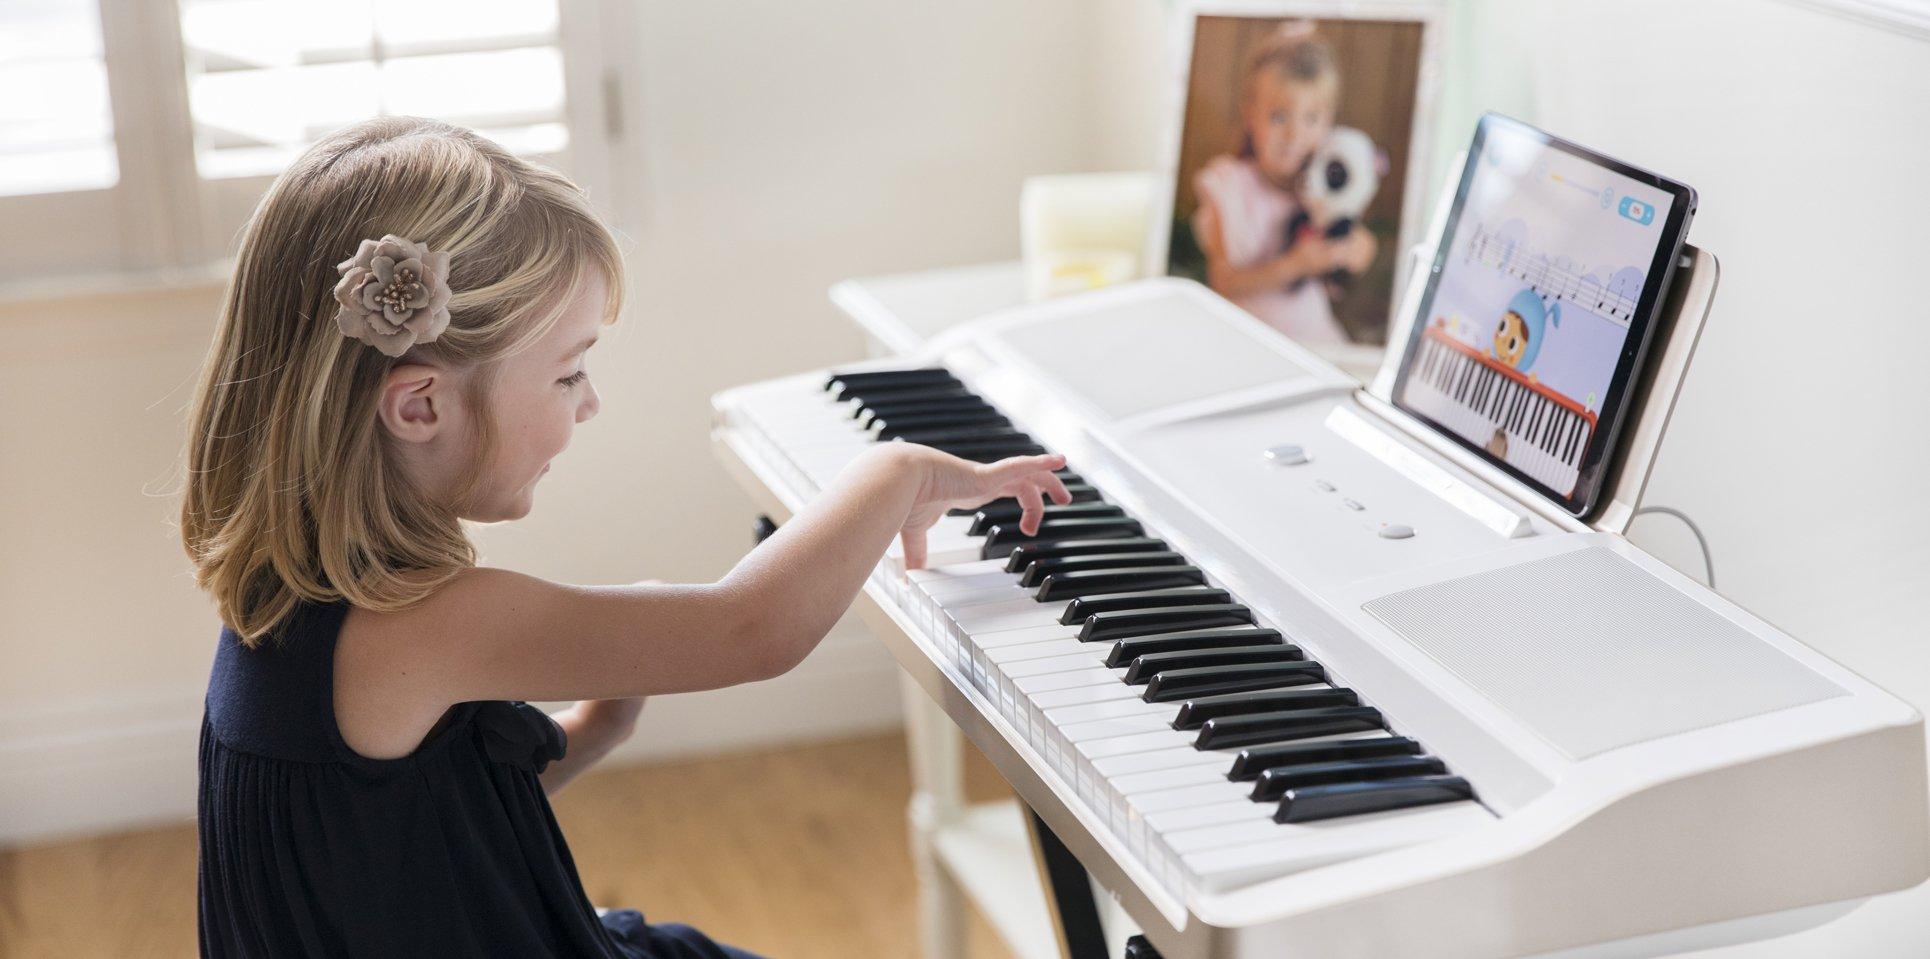 The ONE Smart Piano 61-Key Portable Light Keyboard, USB MIDI Electronic Keyboard Piano - Onyx Black by The ONE Smart Piano (Image #6)